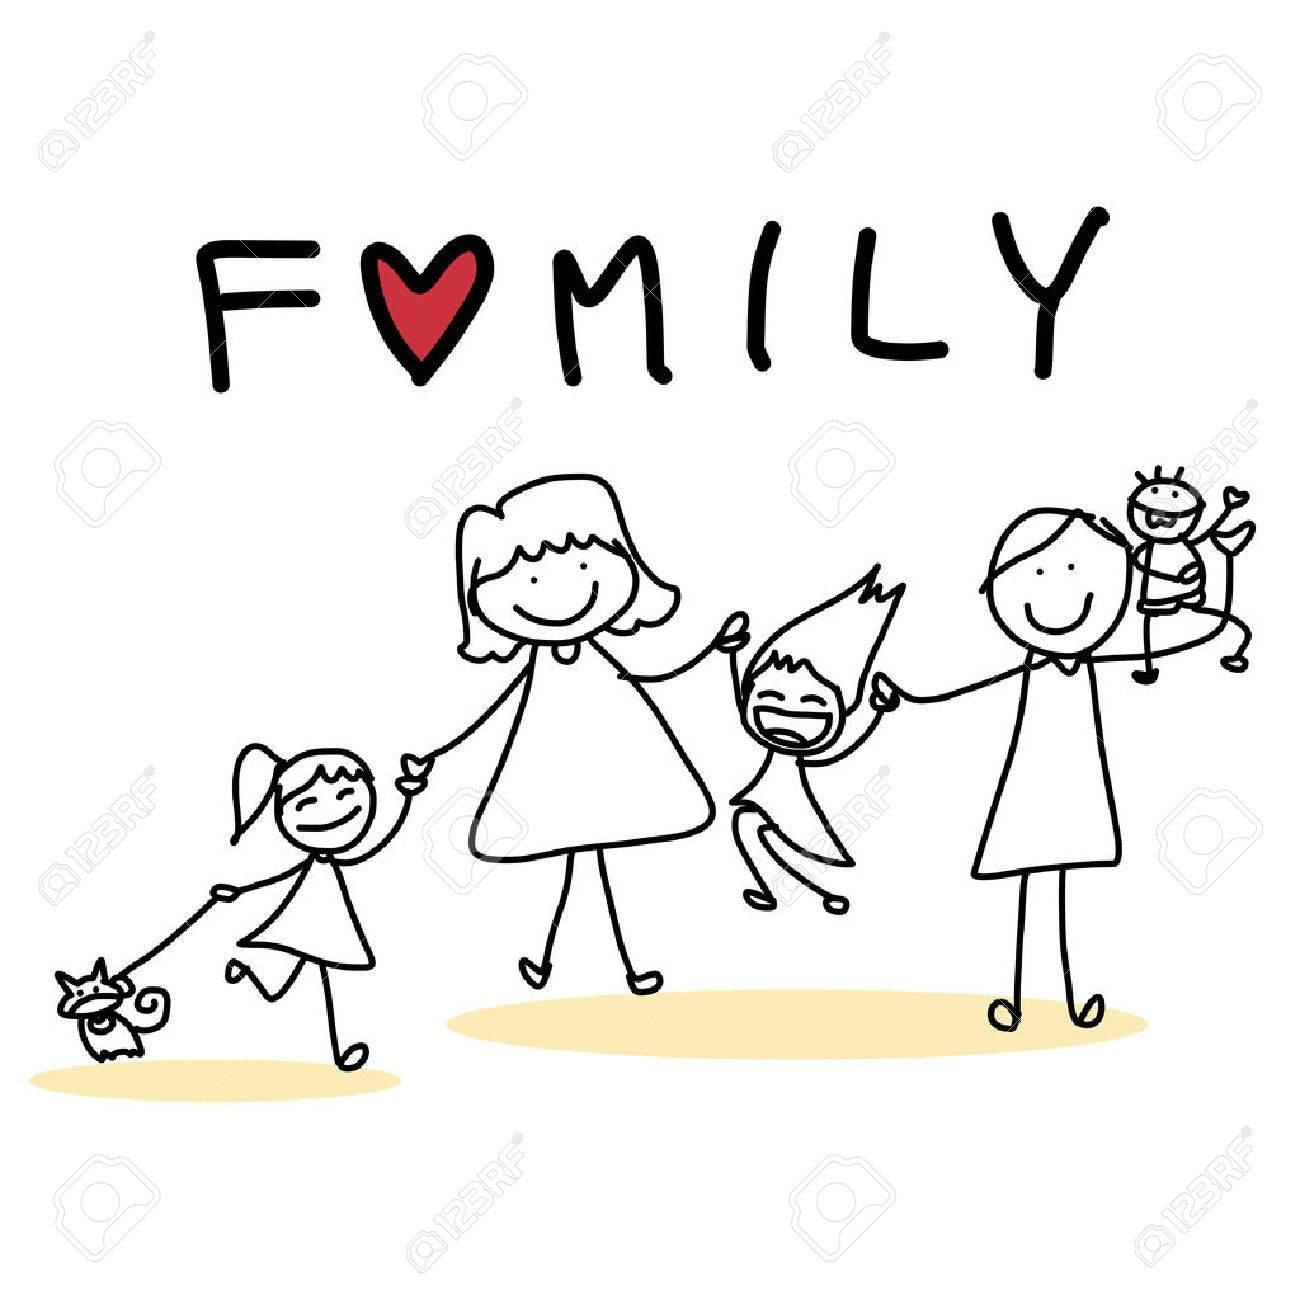 hand drawing cartoon character happy family - 26262334